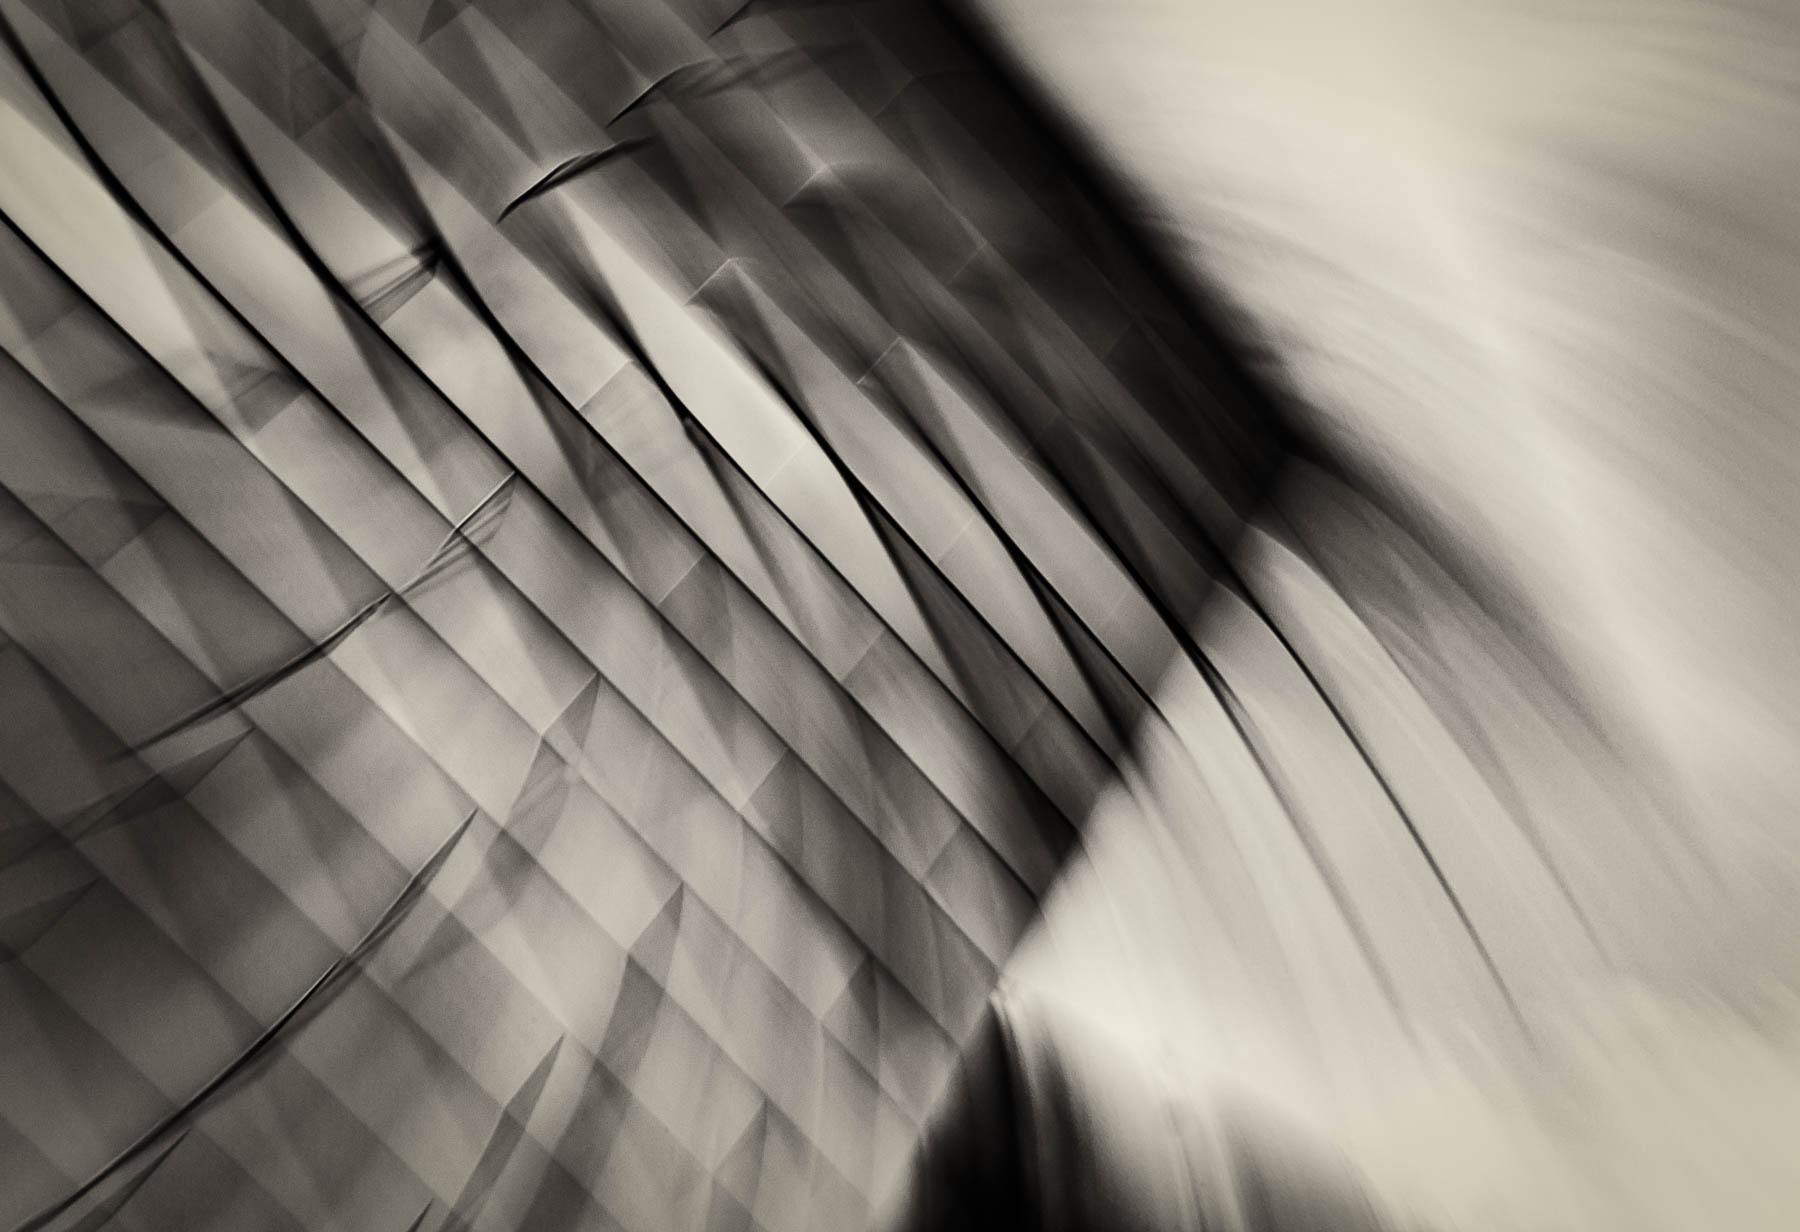 DUTCH_Bagley_Line Waves_Line Up 77_6.jpg